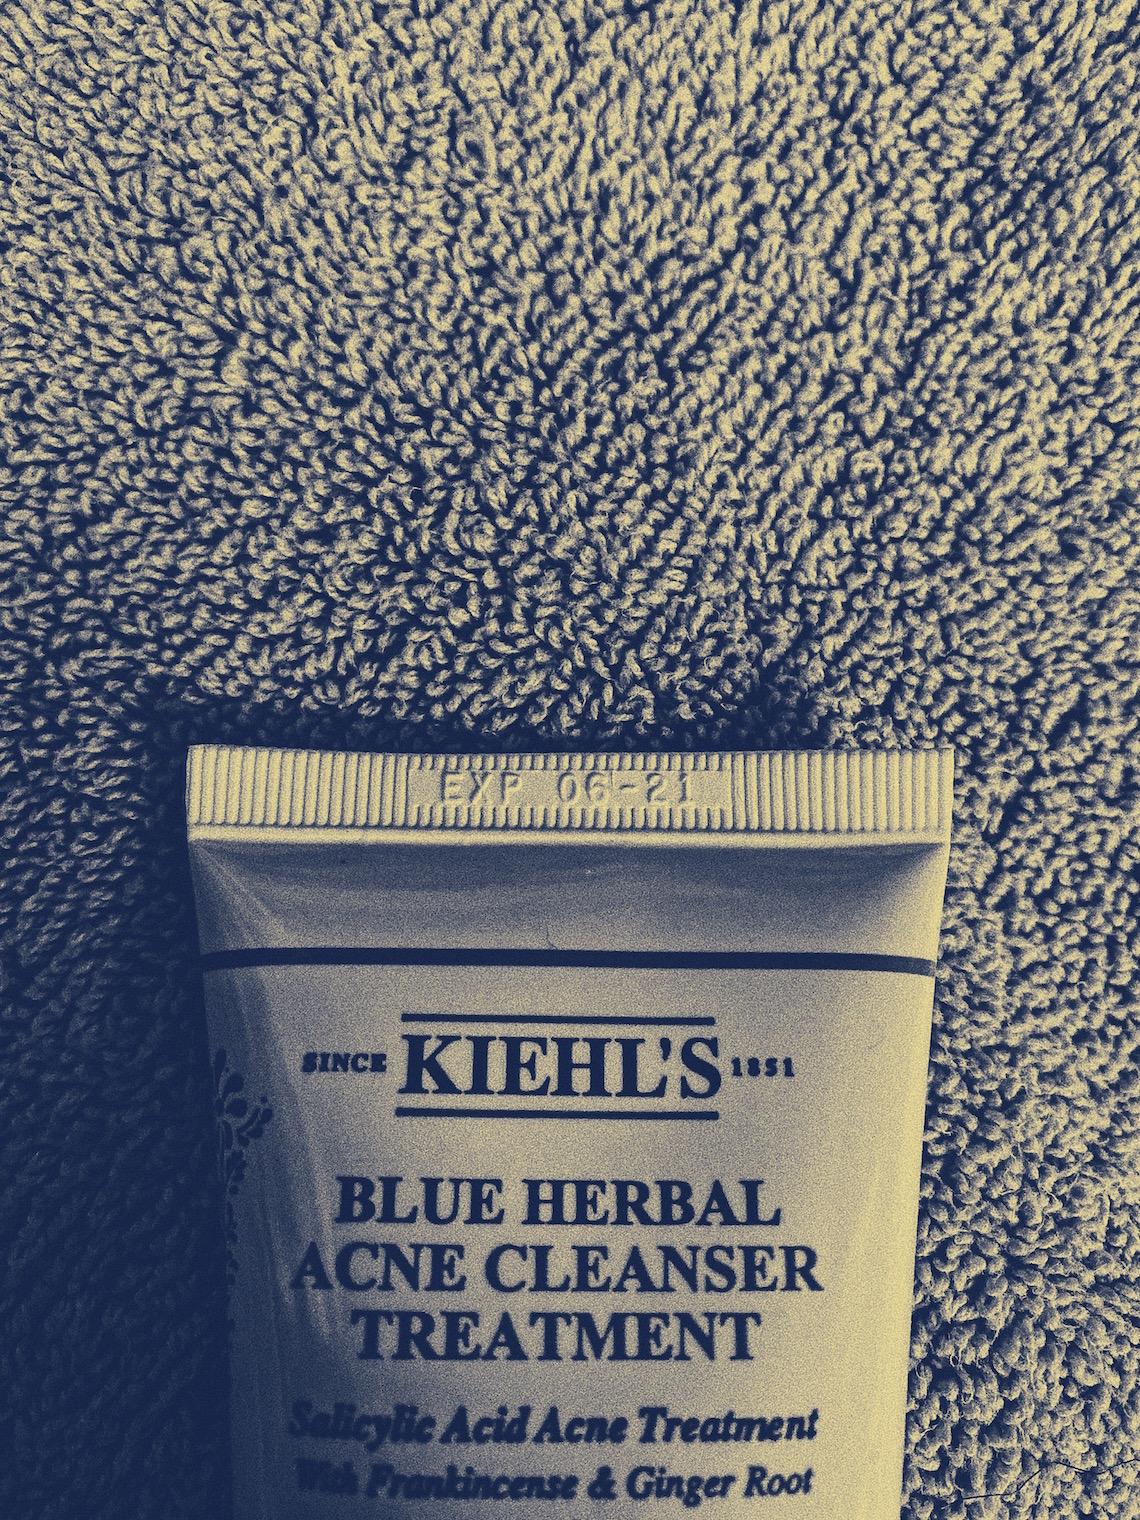 kiehls blue herbal acne cleanser treatment